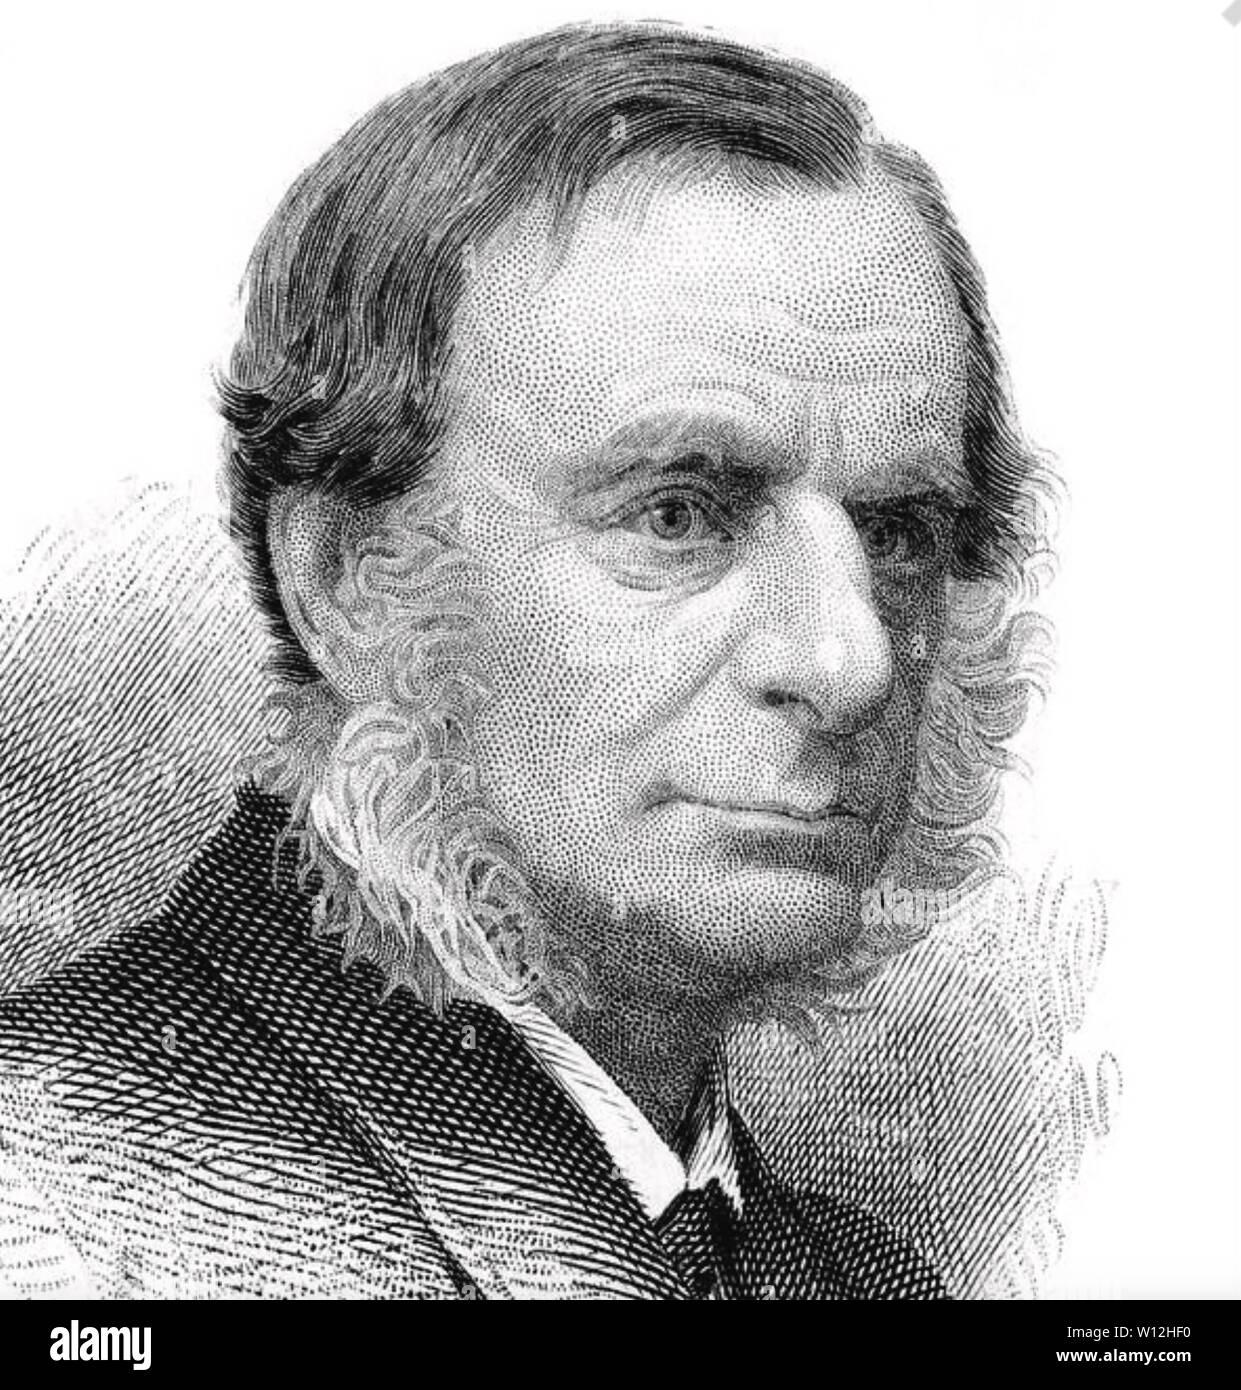 CHARLES KINGSLEY (1819-1875) English novelist and social reformer - Stock Image